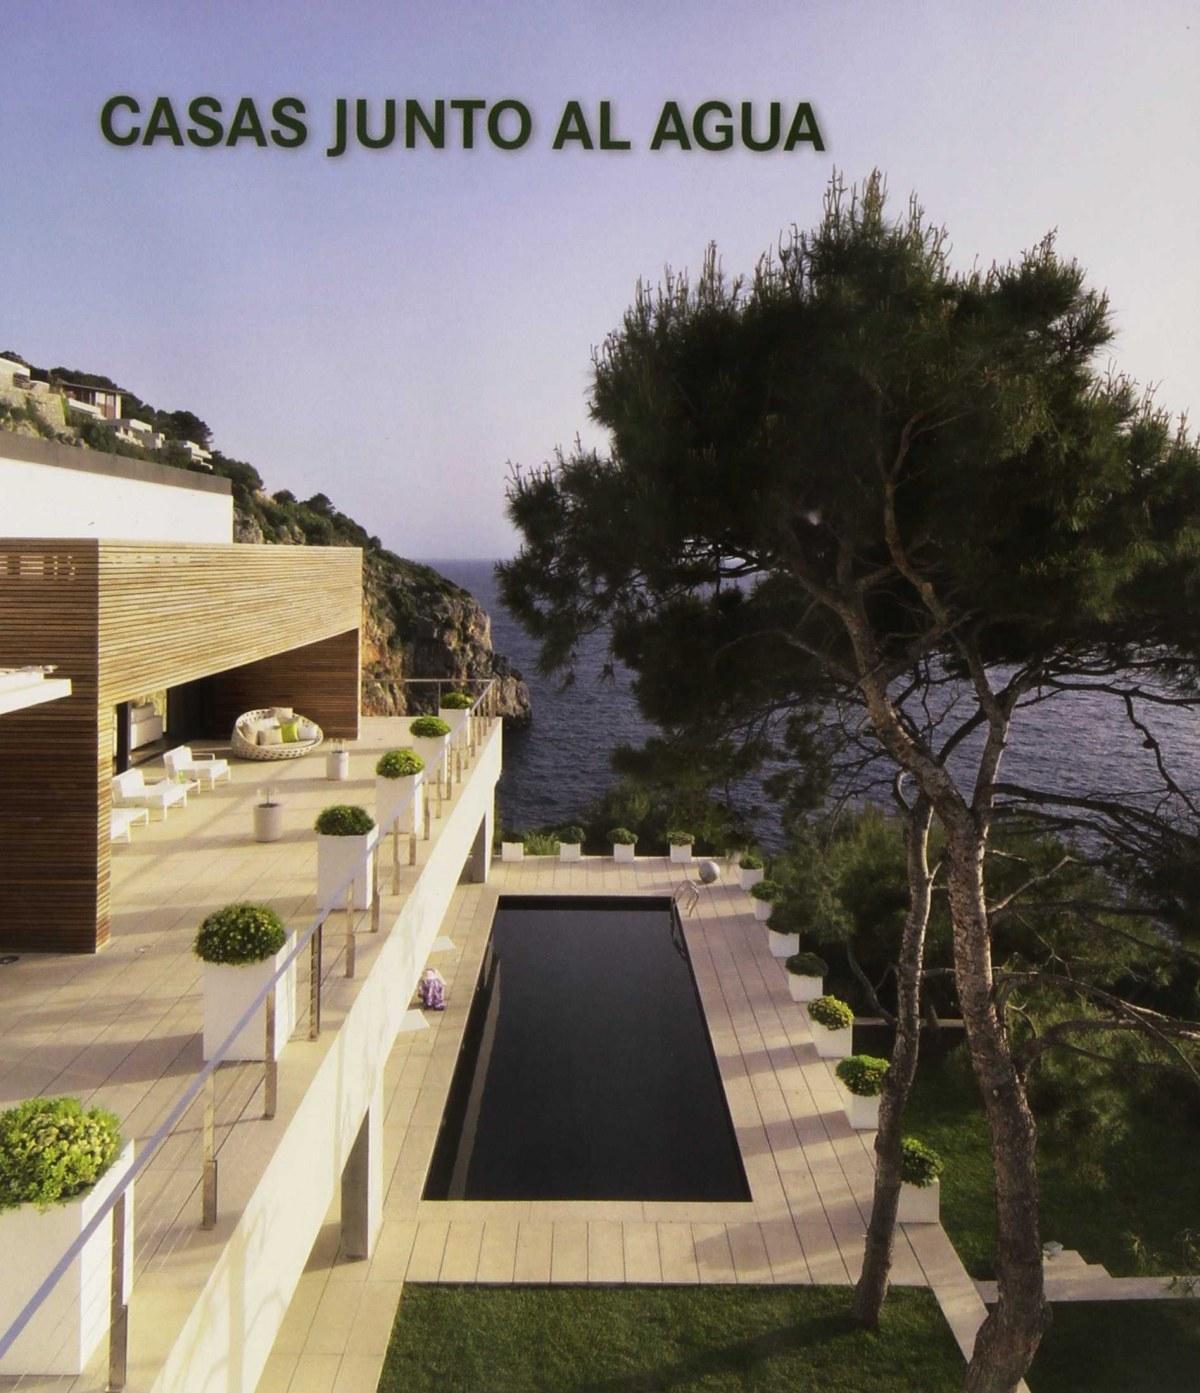 Casas junto al agua 9783864075490